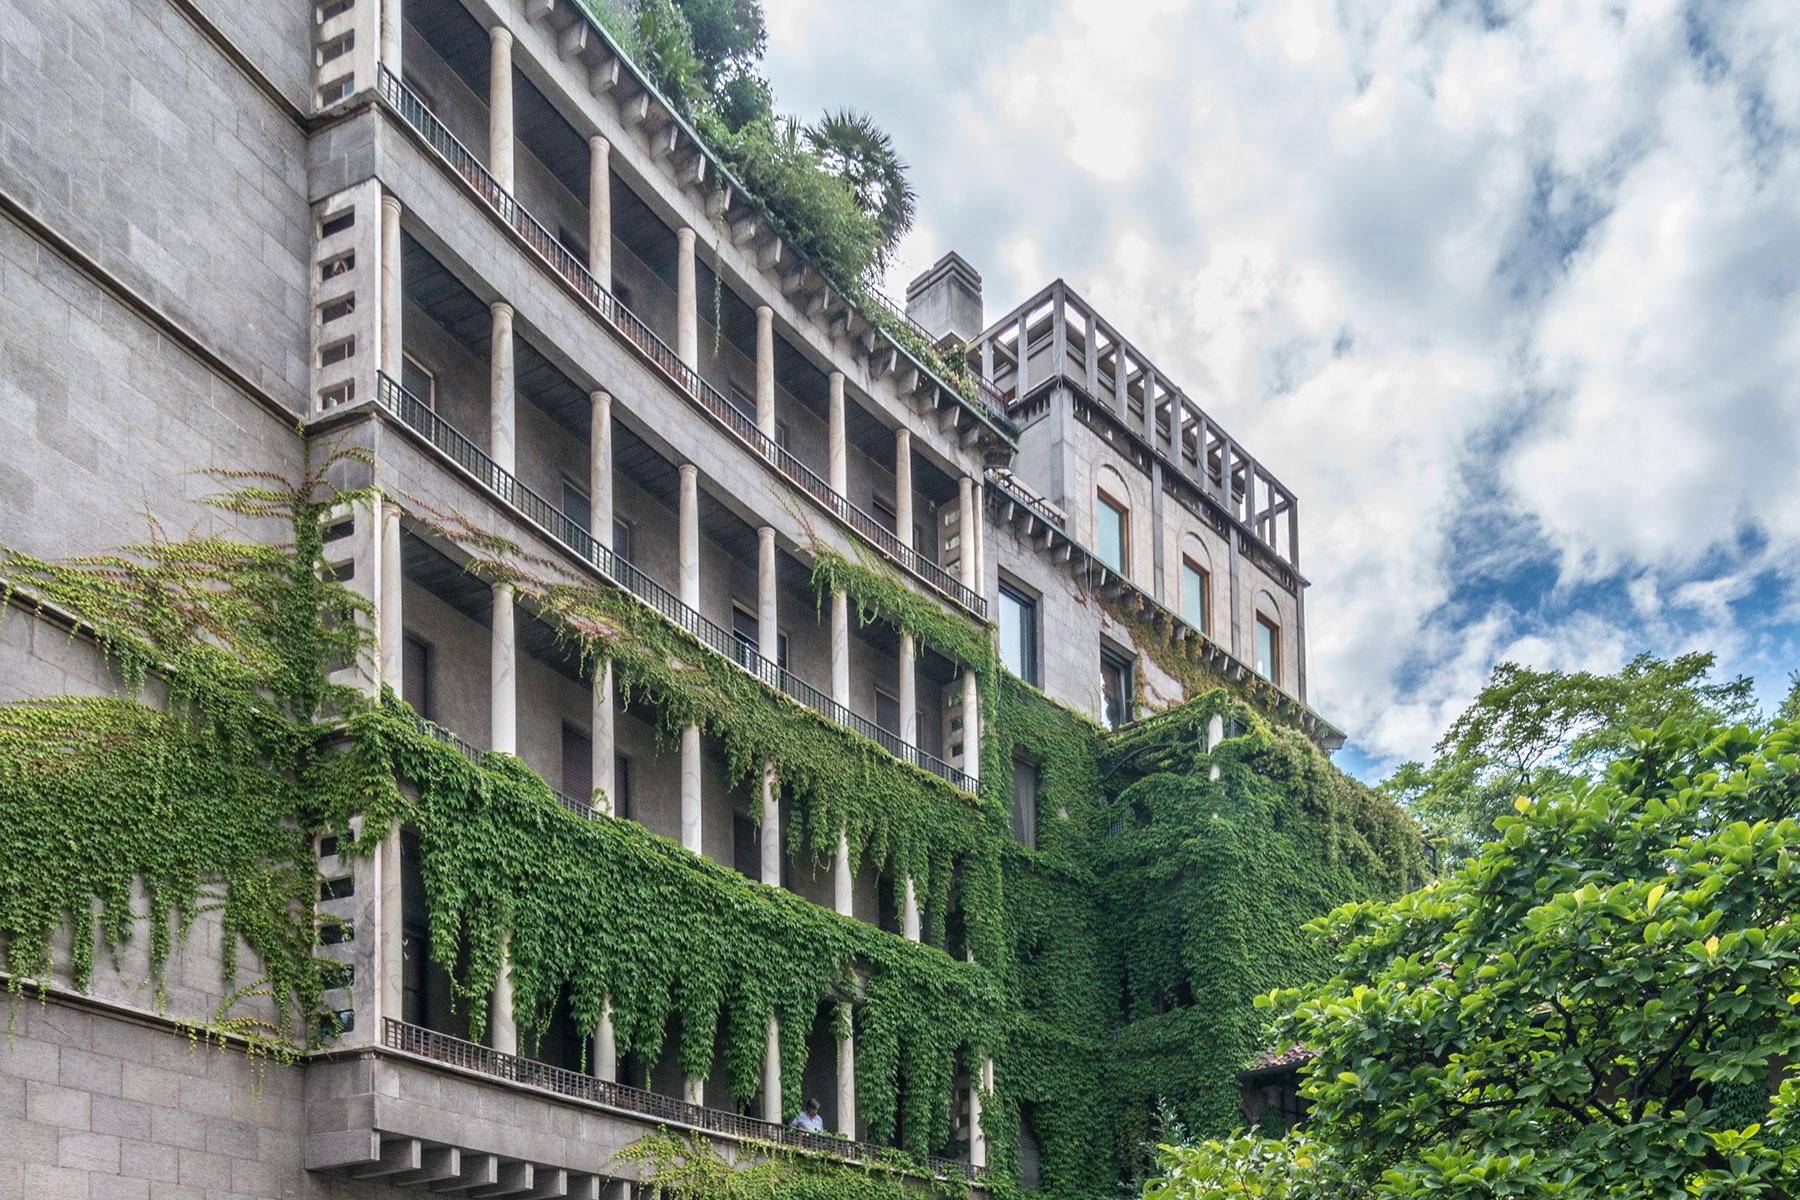 Additional photo for property listing at Elegant apartment in the historical center of Milan Via dei Giardini Milano, Milan 20100 Italy